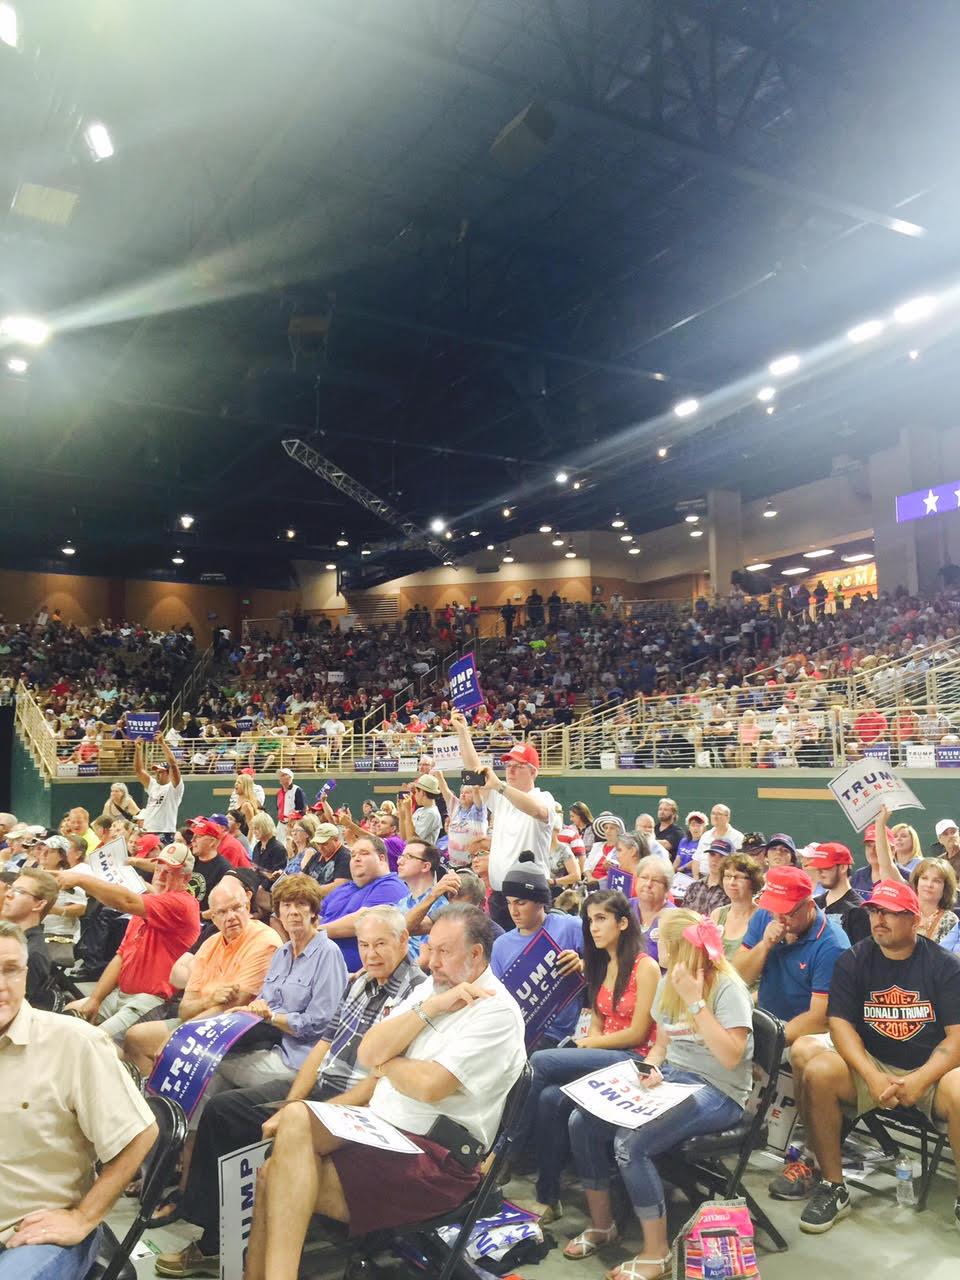 Trump Slams Hillary And Obama Lights Up Crowd At Florida